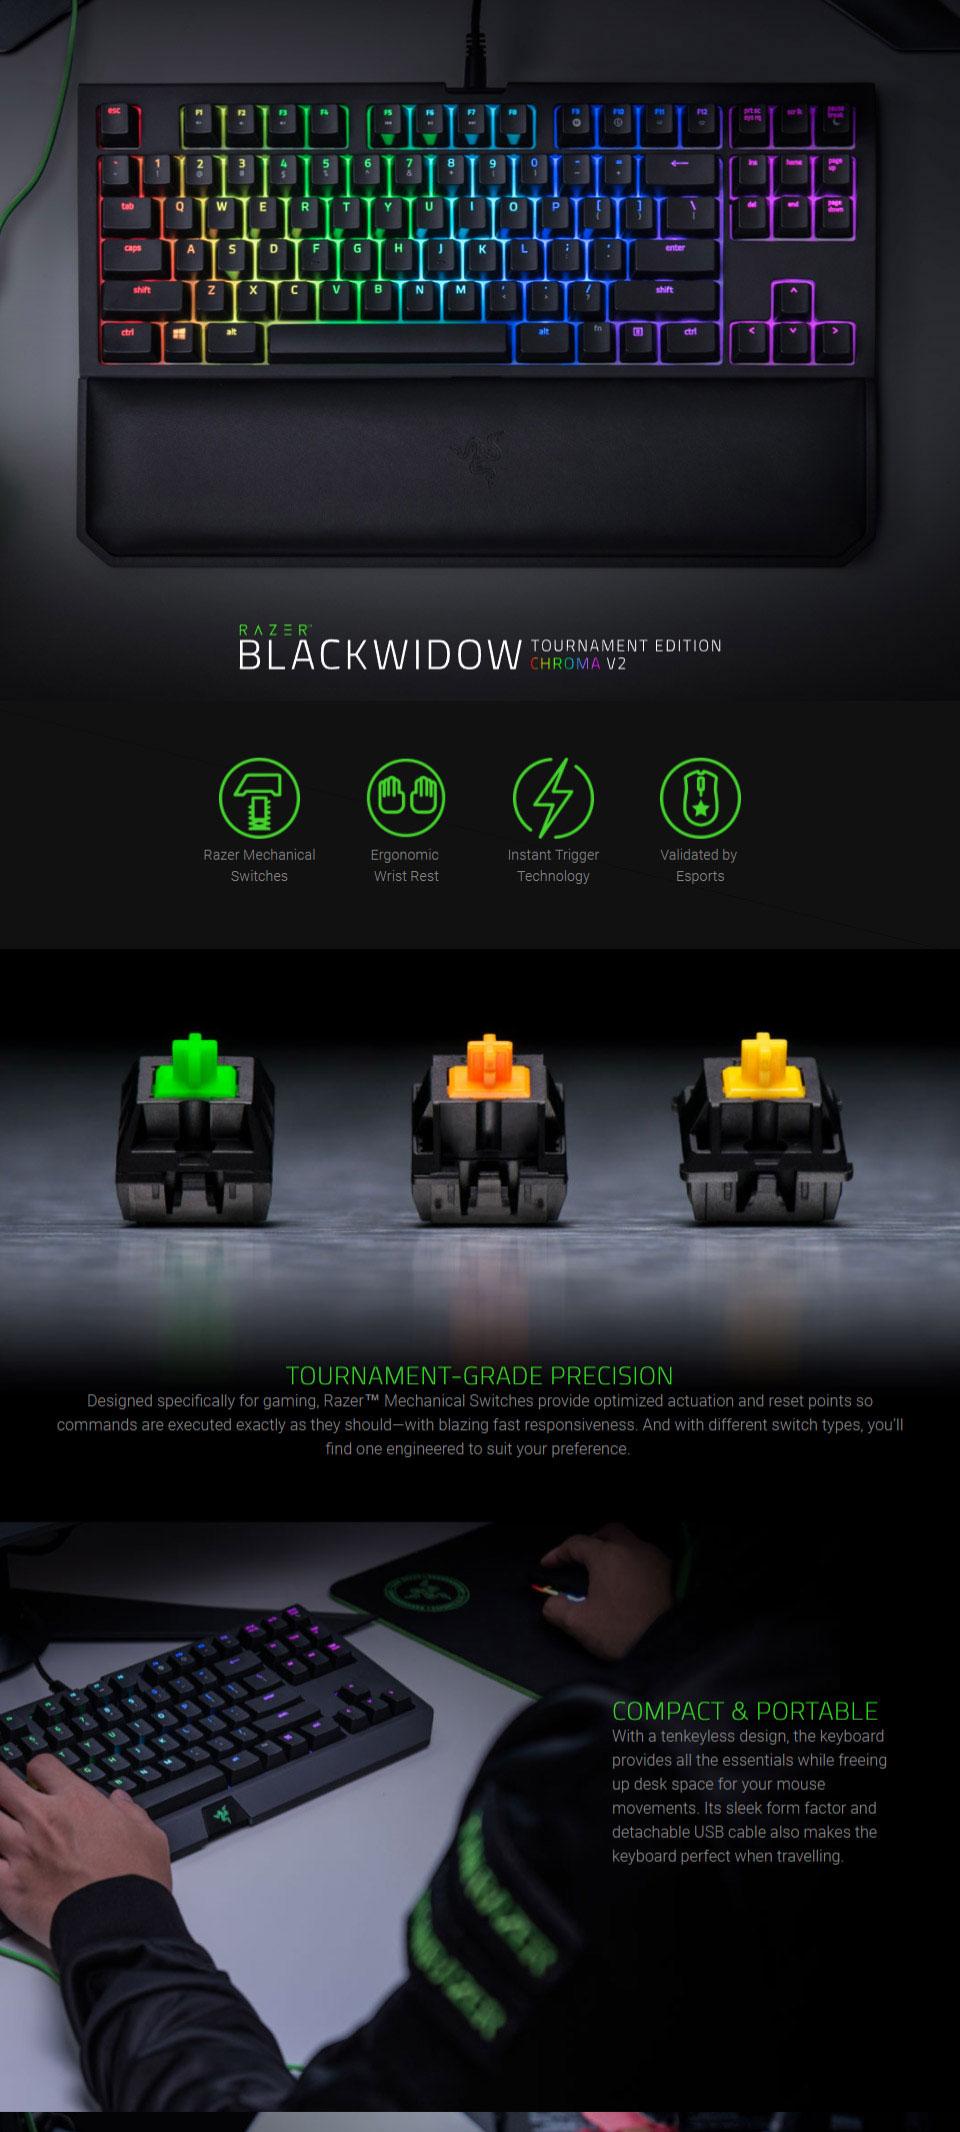 Razer Chroma Blackwidow TE V2 KB (Yellow Switch) and Mamba